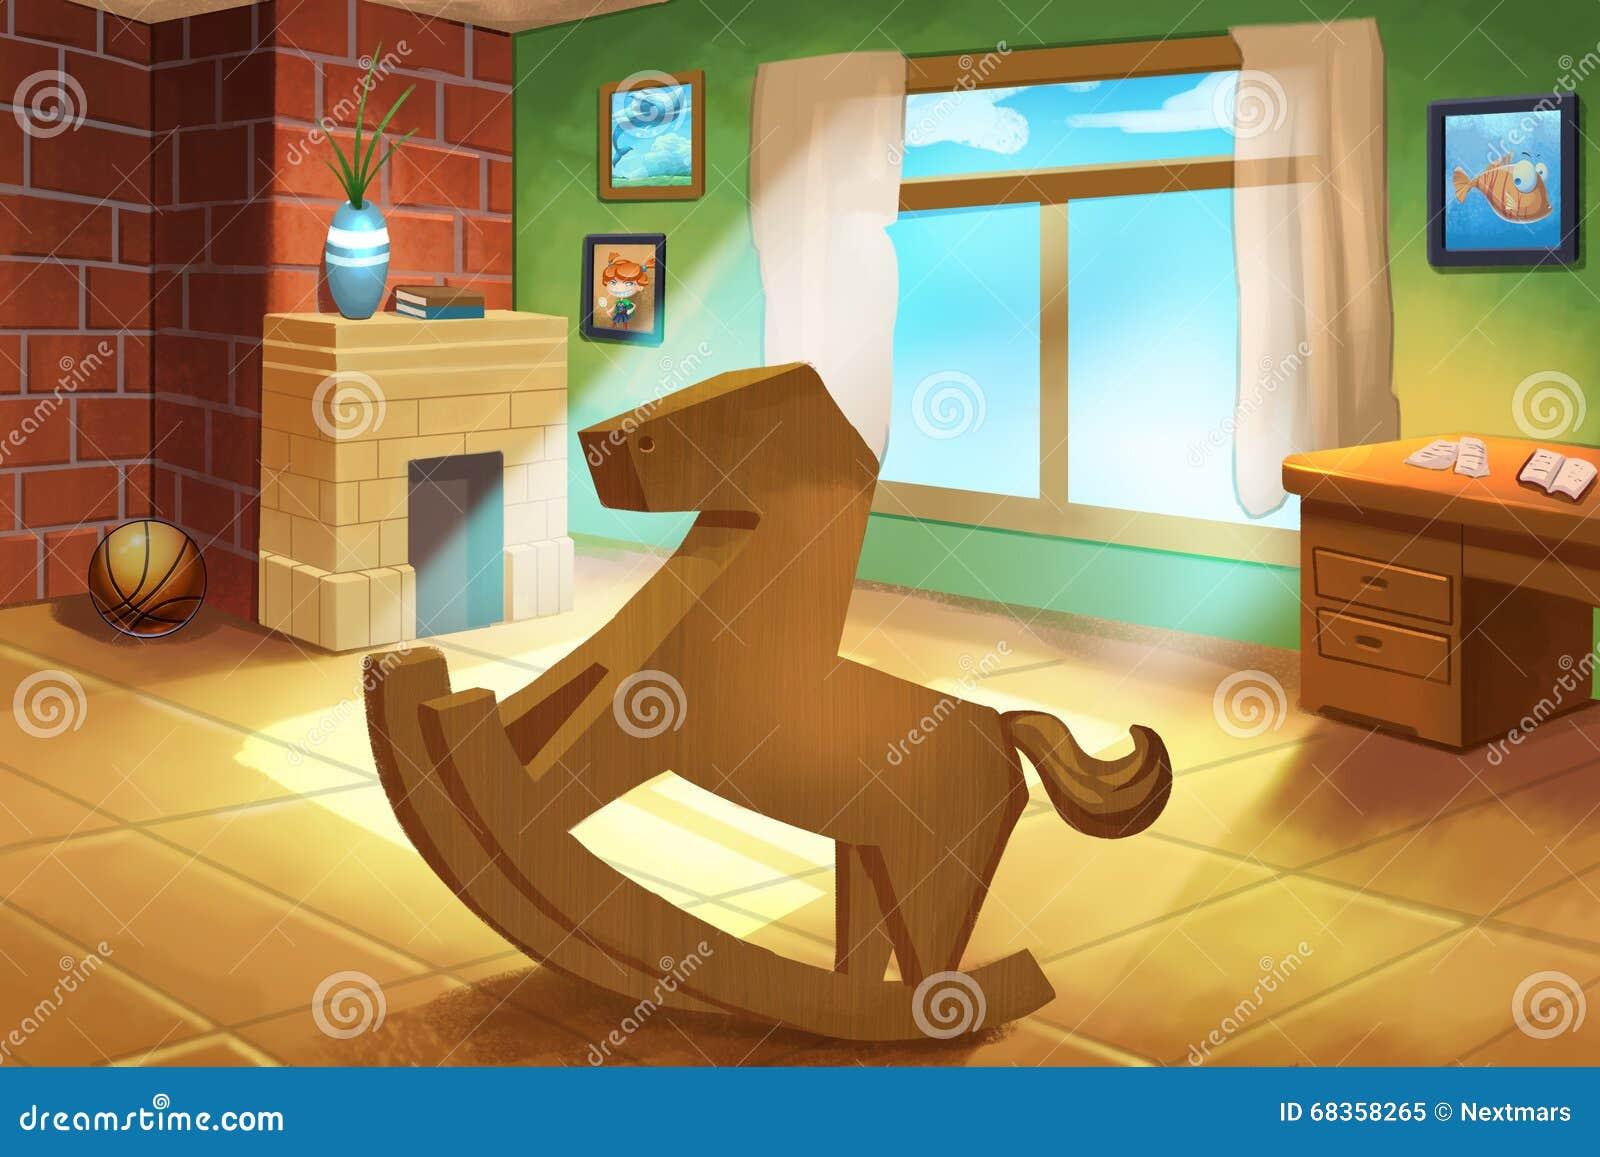 Illustration For Children Little Kids Room With A Wooden Horse Rocking Chair Stock Illustration Illustration Of Floor Fantastic 68358265